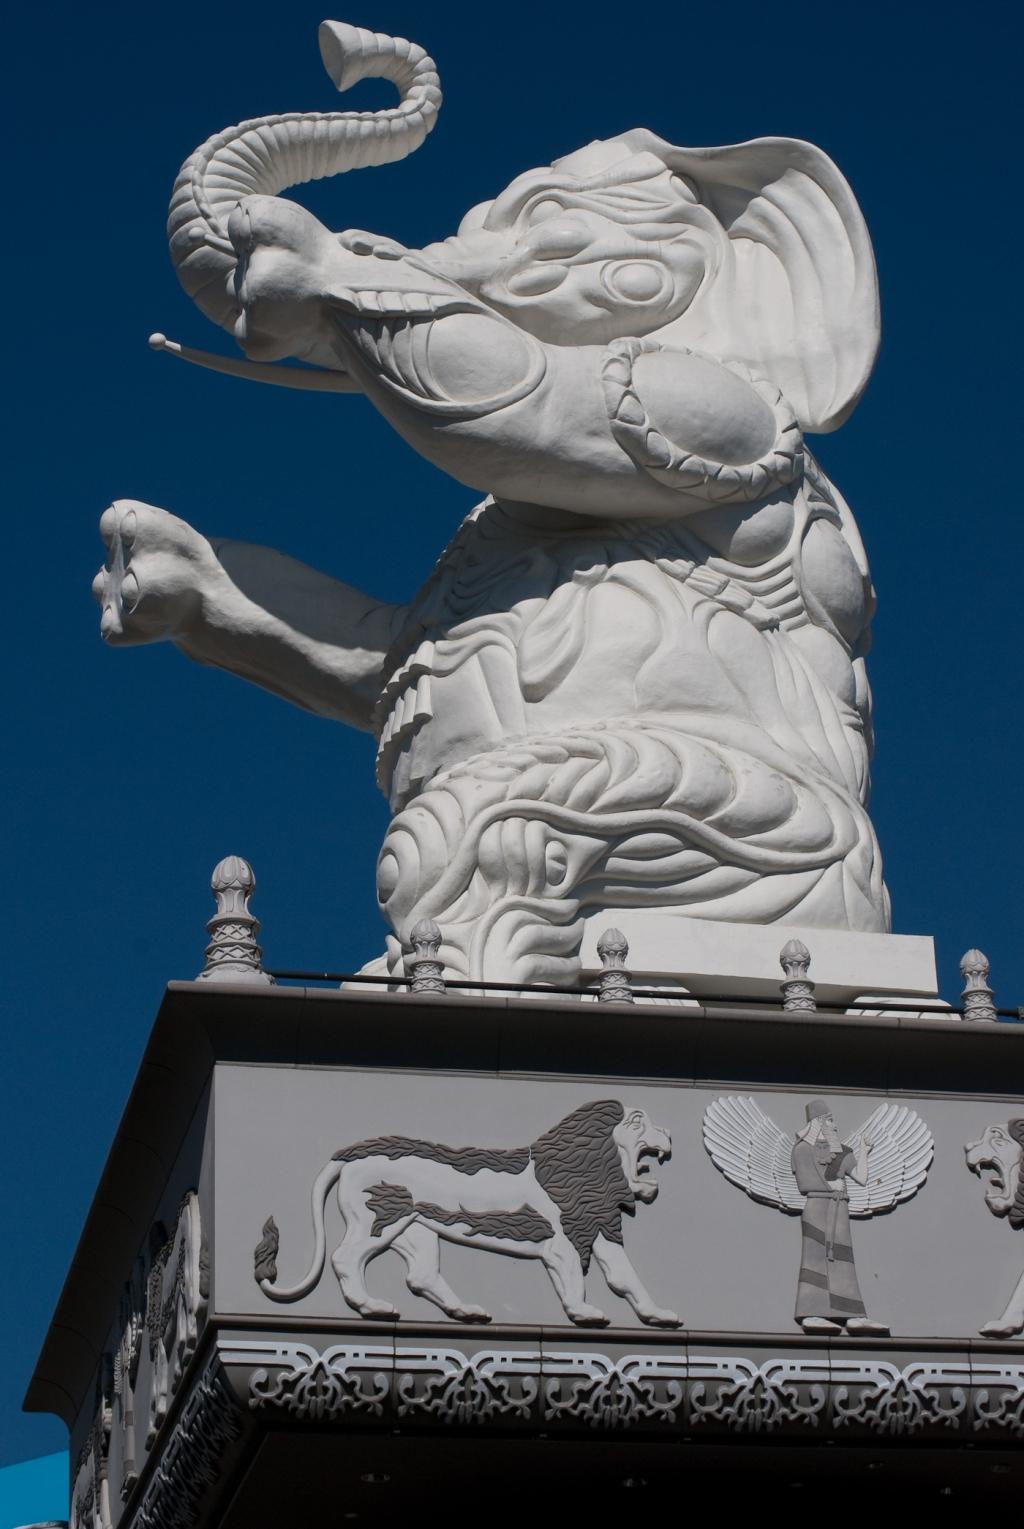 White Elephant - Hollywood Boulevard - Los Angeles